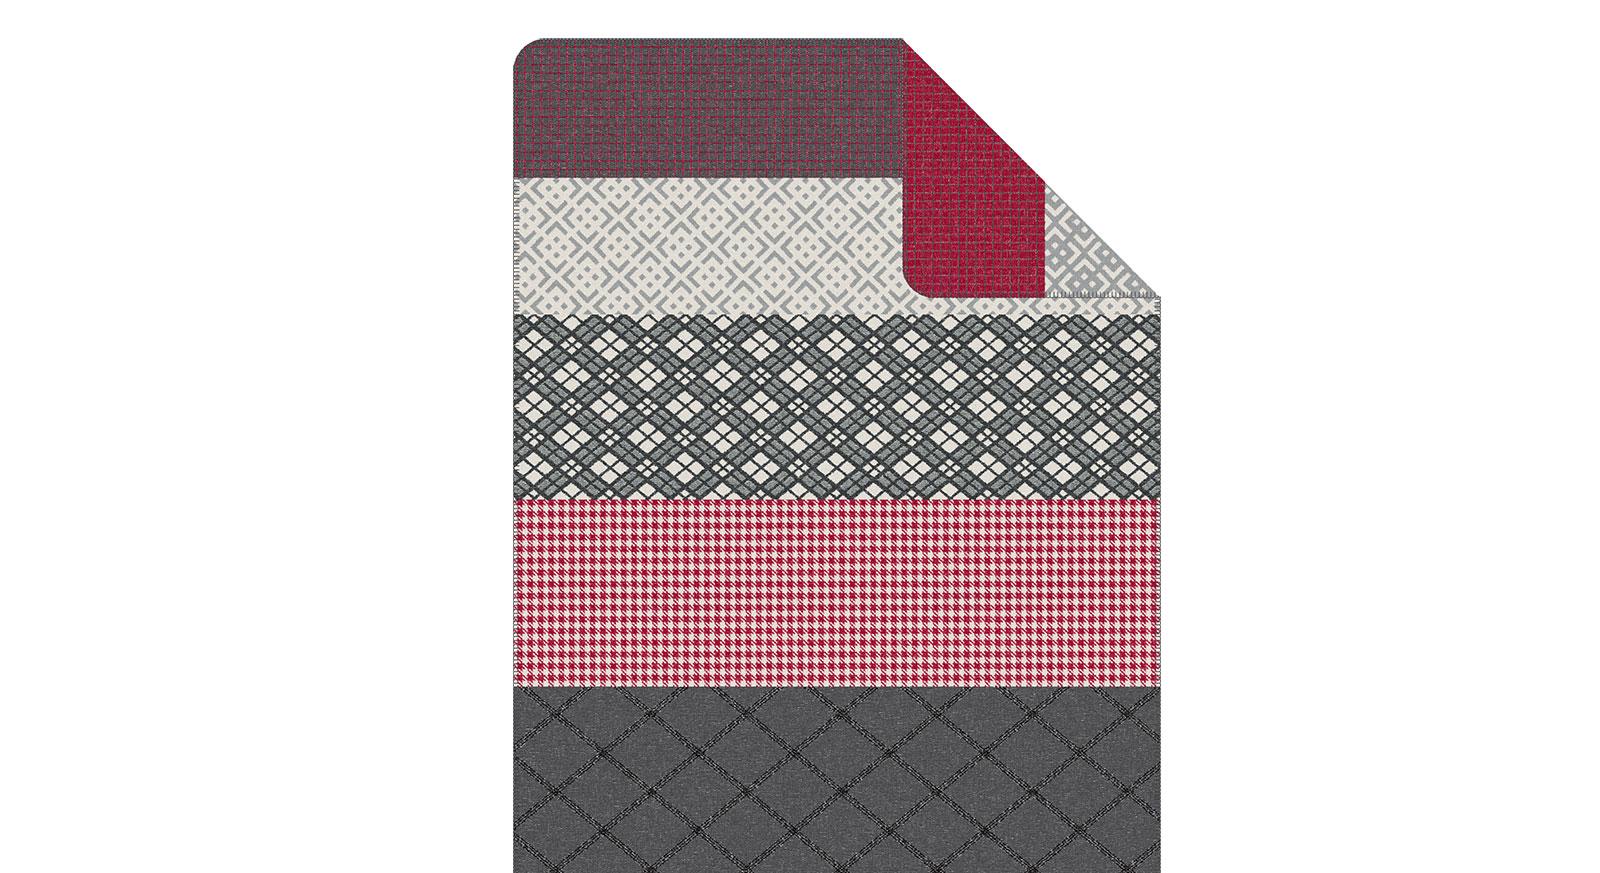 Jacquard-Decke s.Oliver Mustermix mit modernem Zierstich